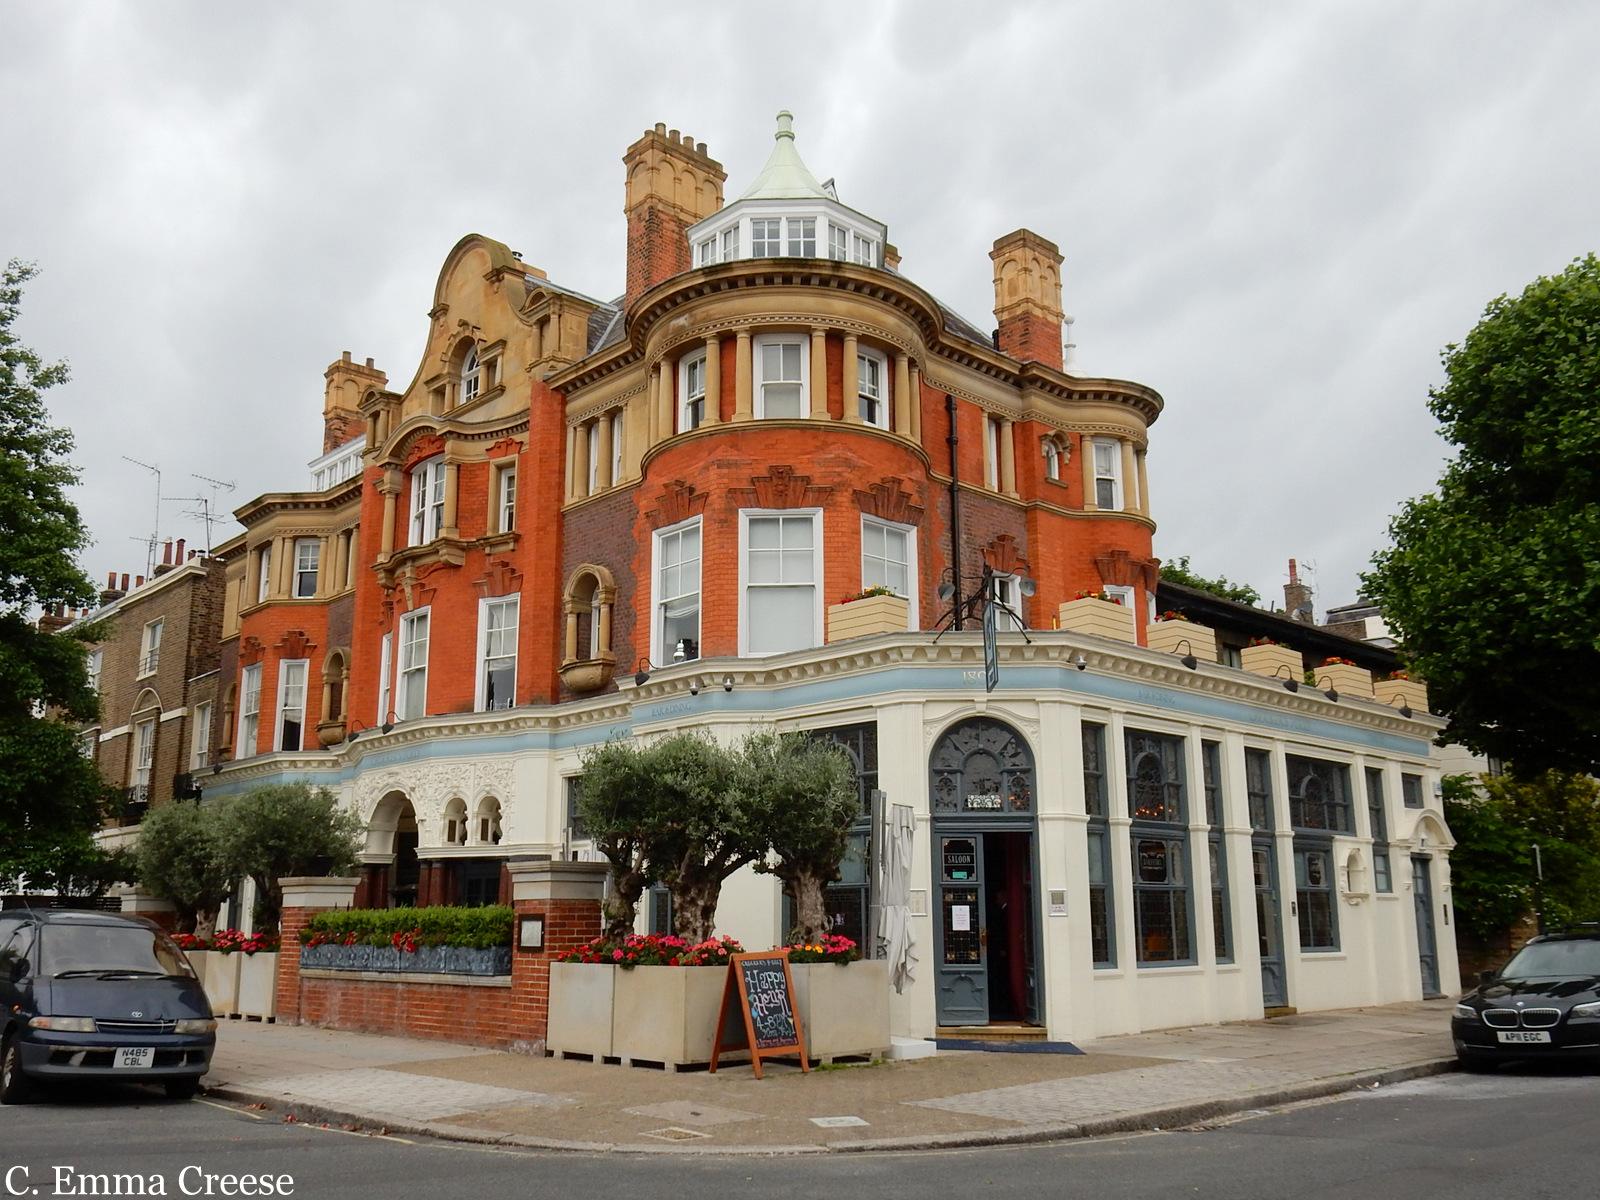 Maida Vale Pub Lately Adventures of a London Kiwi